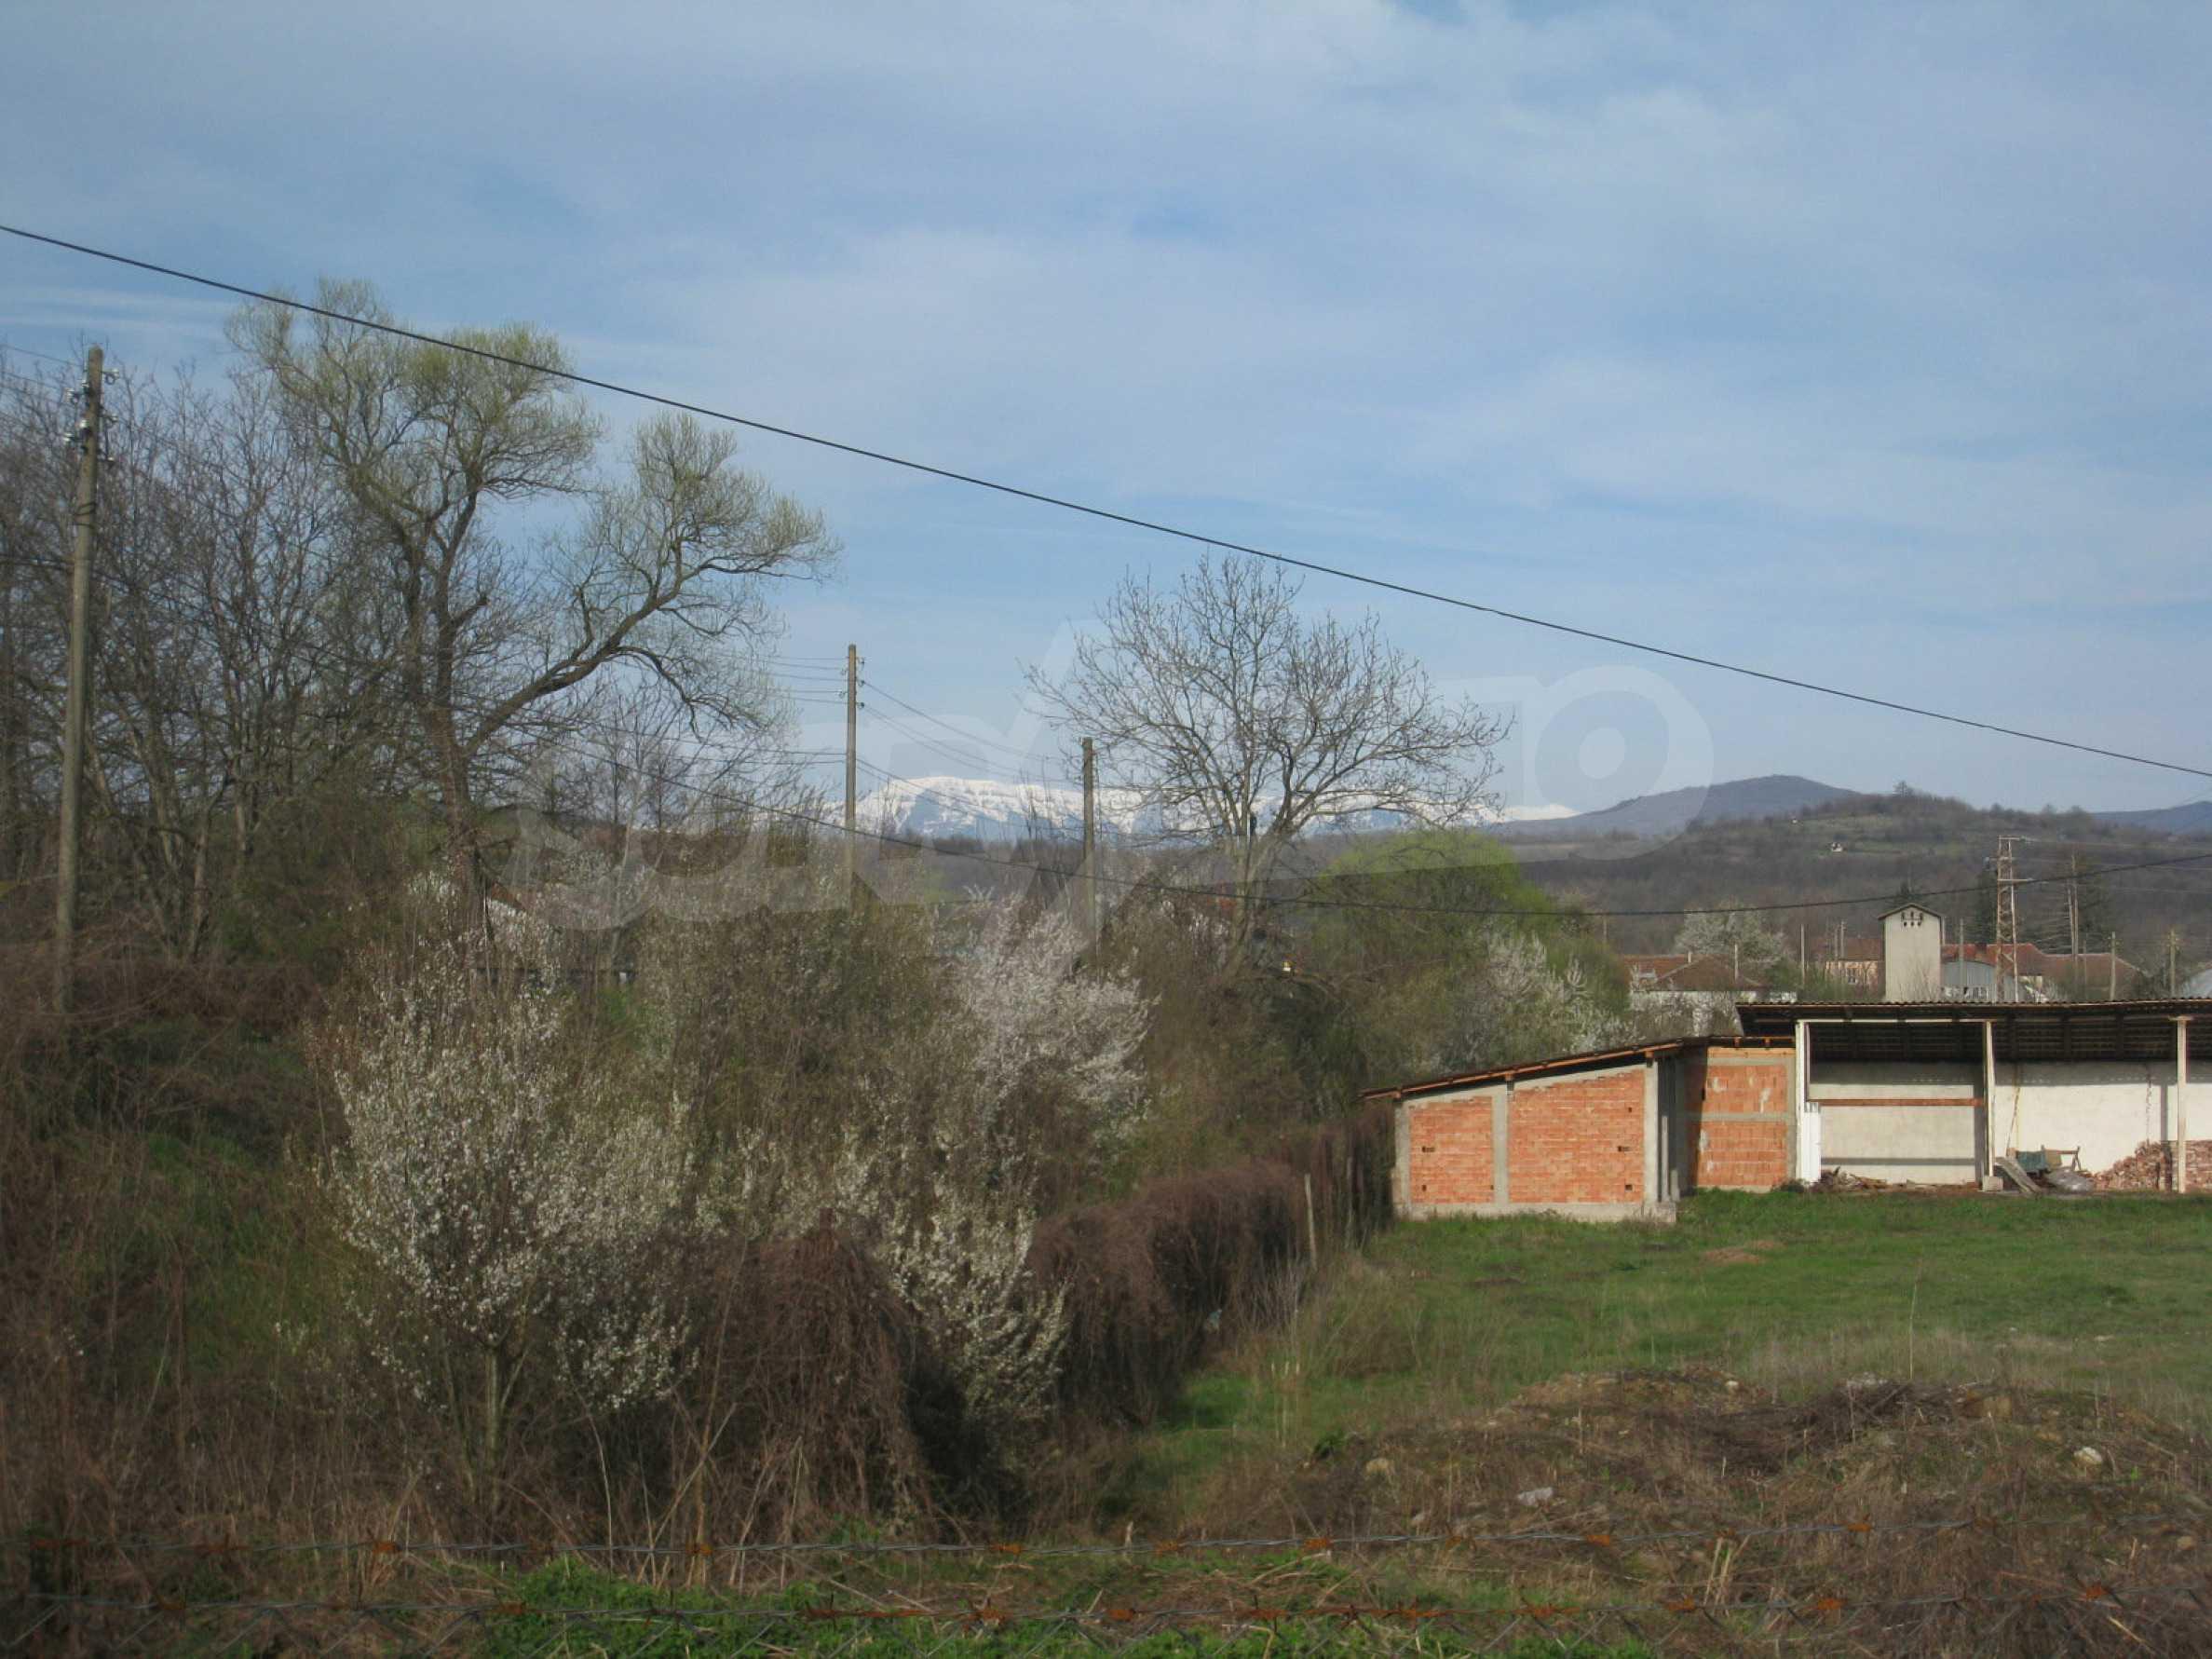 Fishpond, warehouses, residential areas and asphalt ground near Montana 39